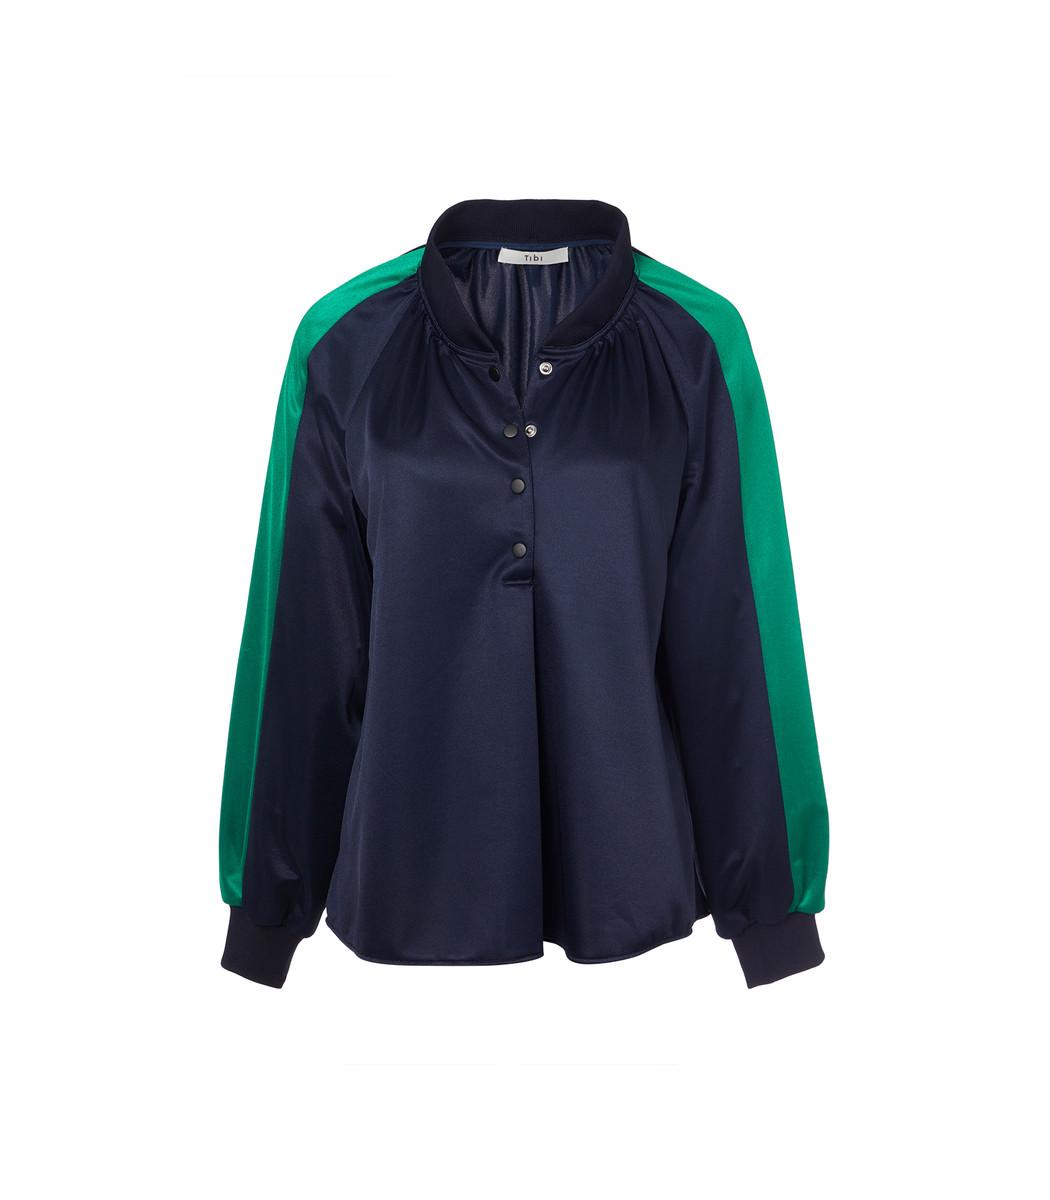 TIBI Navy/Green Multi Tech Pique Raglan Pullover